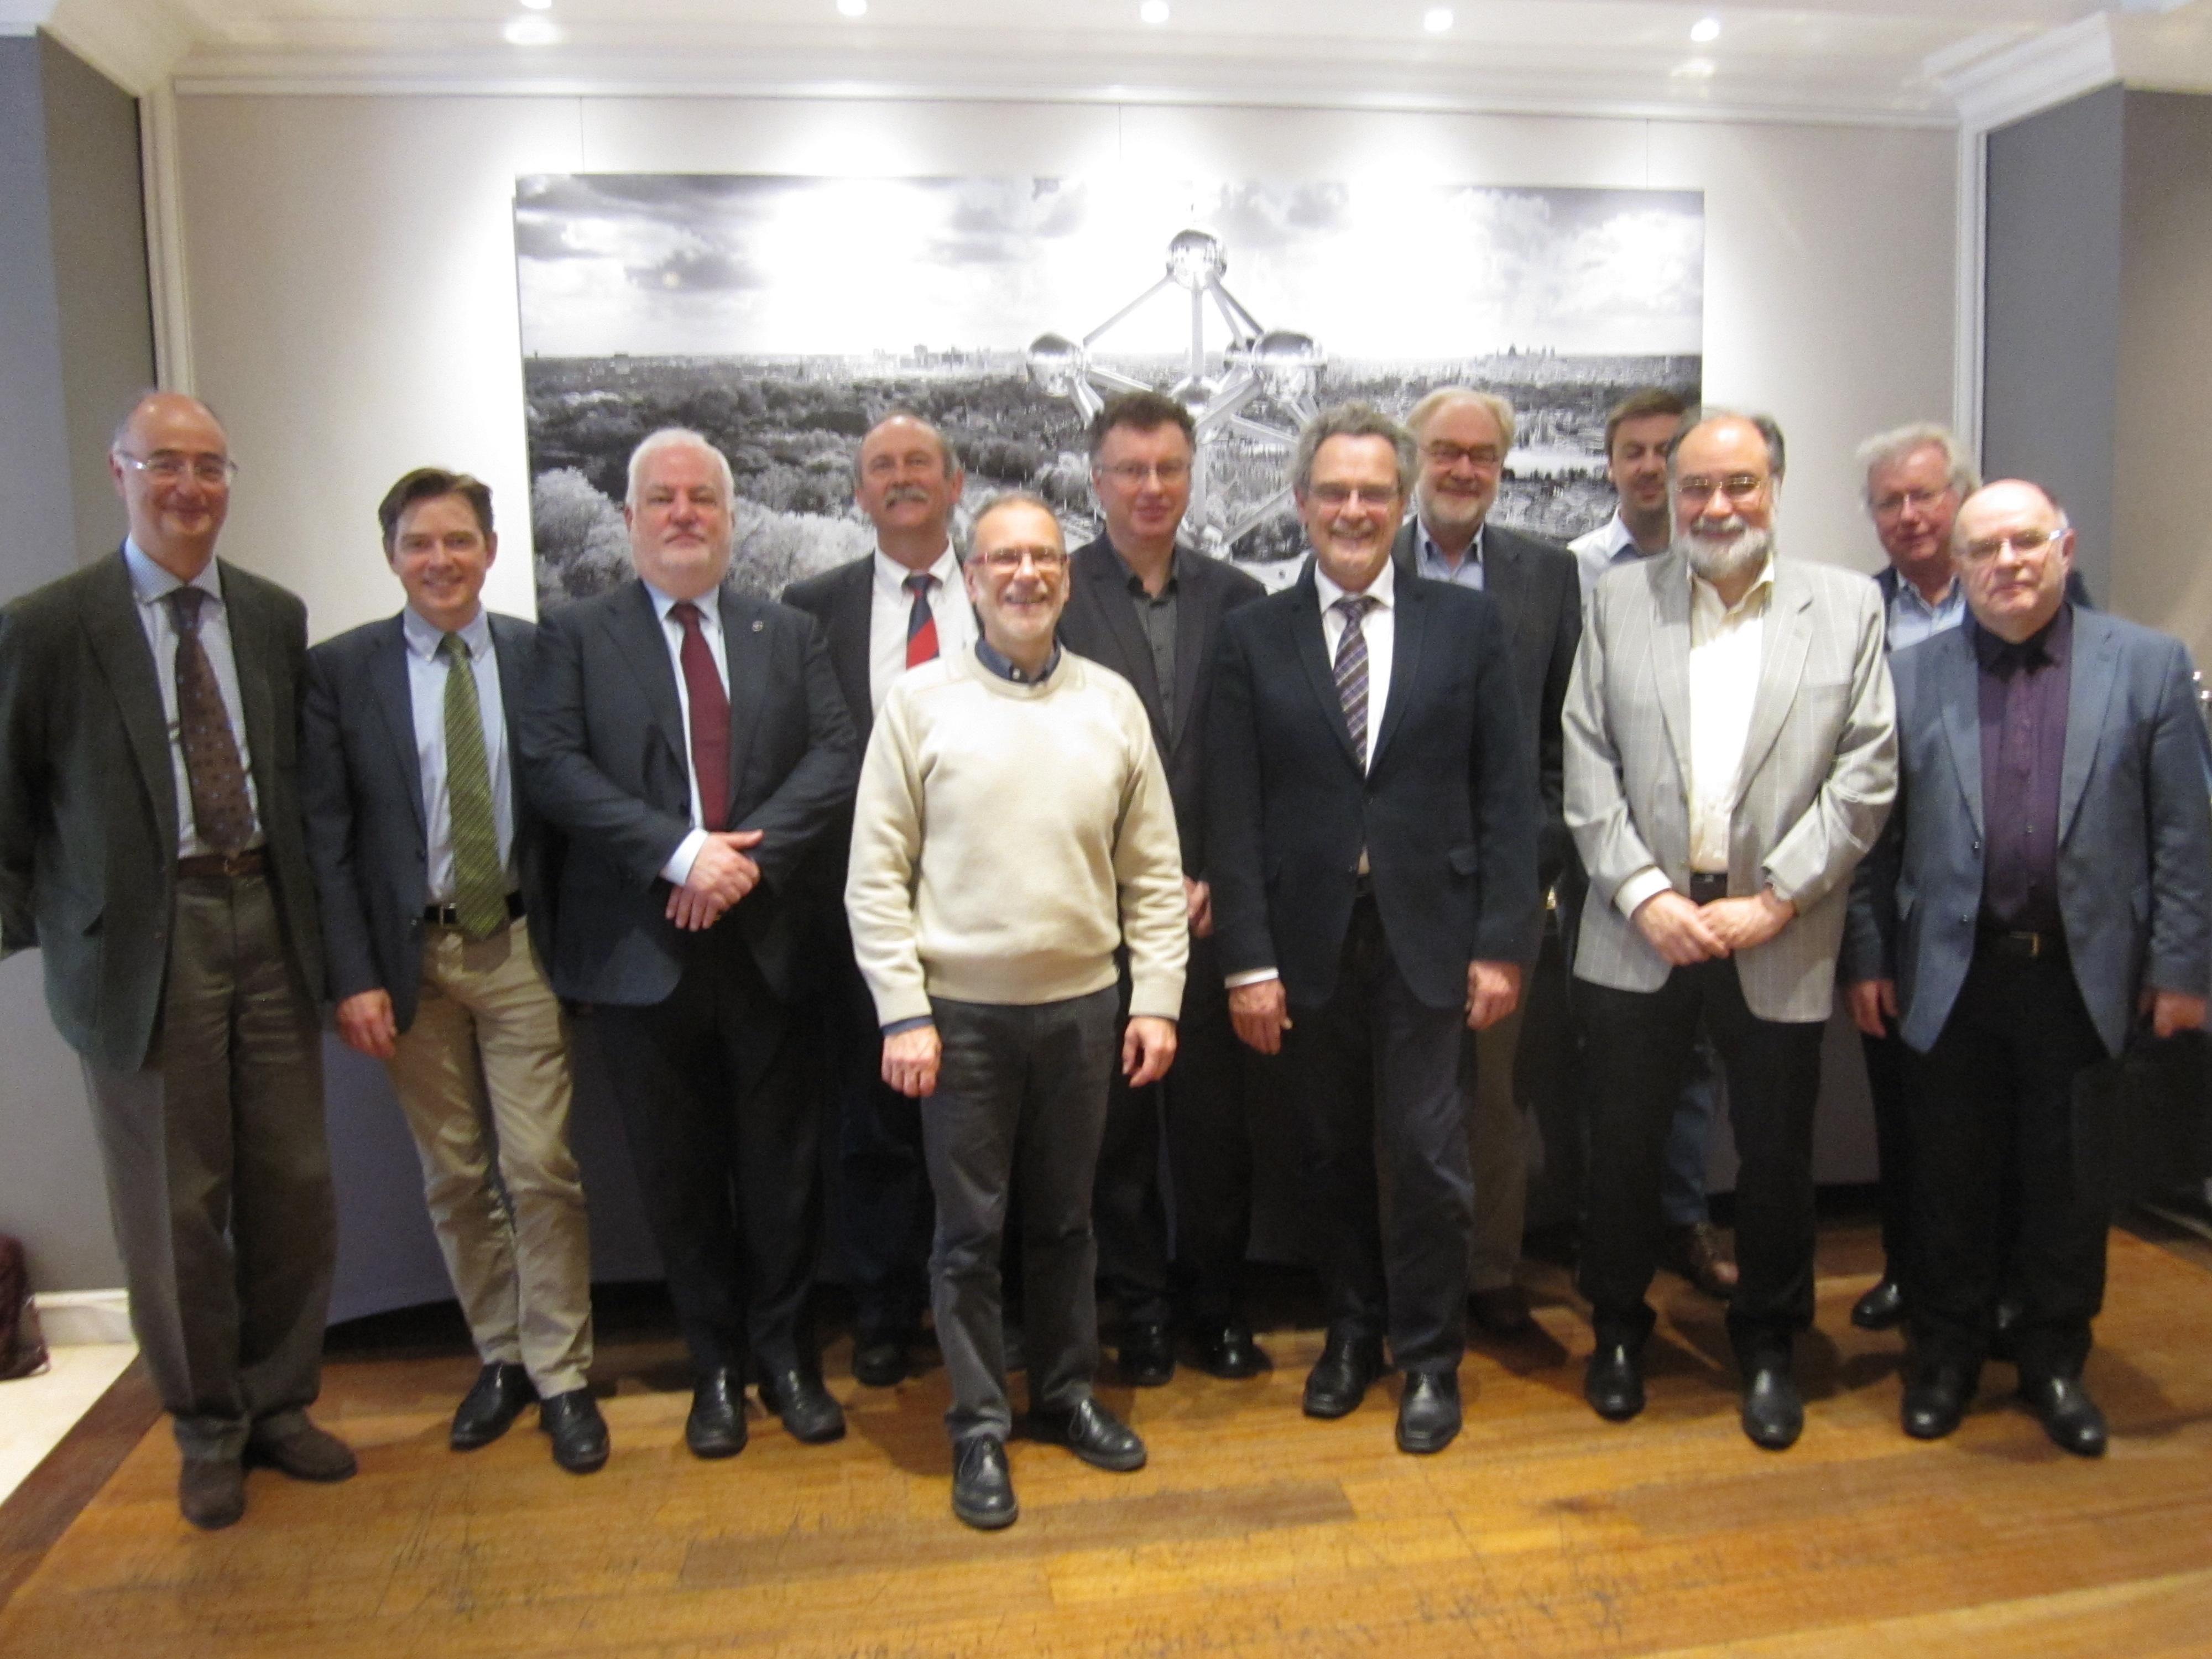 UEMS Allergology meeting in Brussels April 2016